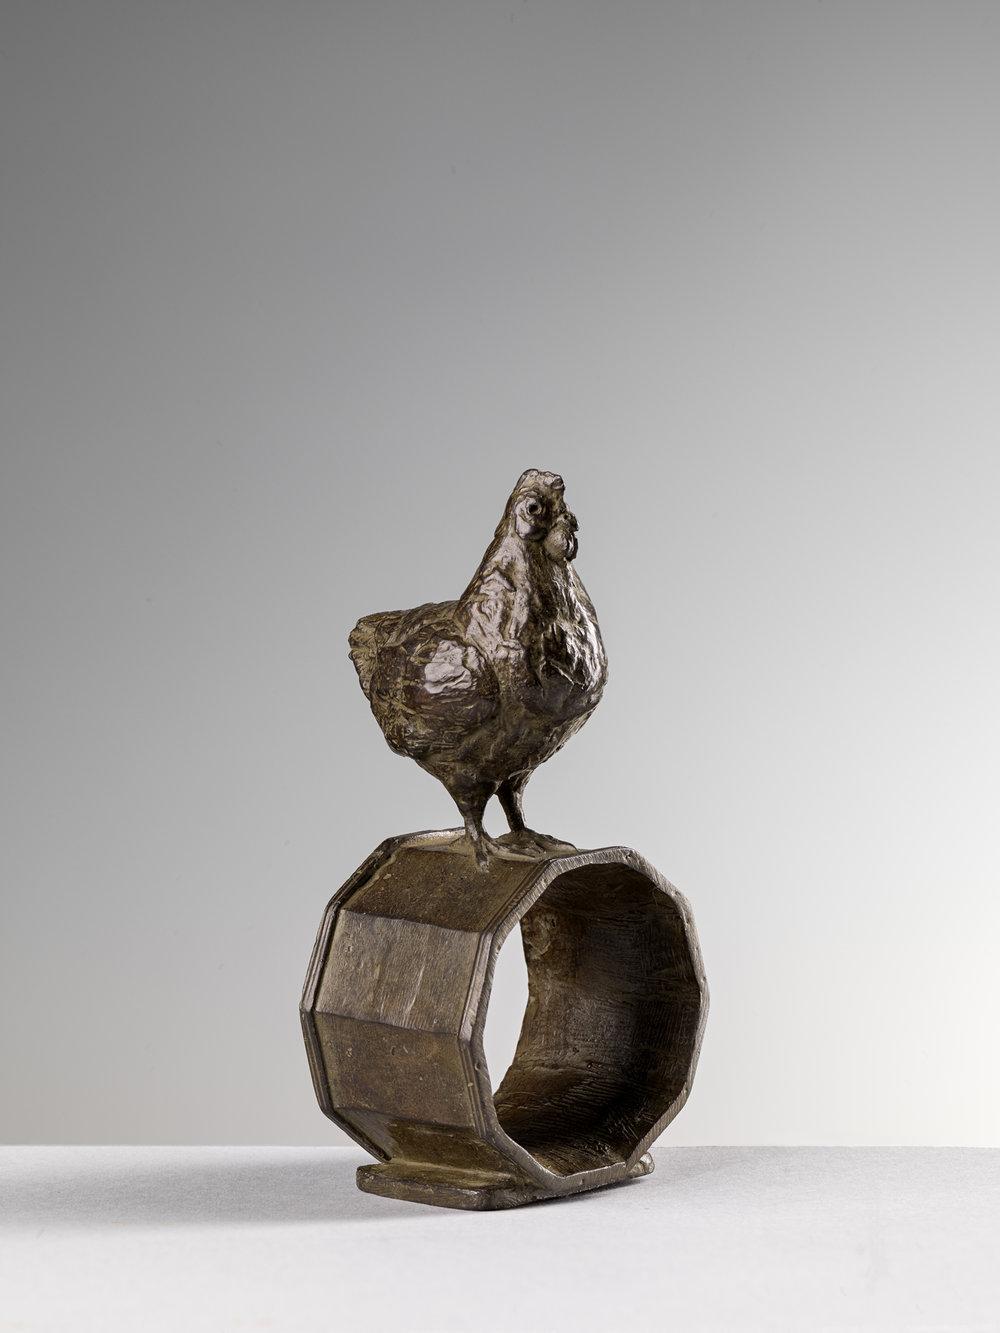 17. Hen Napkin Ring, 'Gallina' by Nicola Lazzari 11cm H x 5cm W x 5cm D.jpg